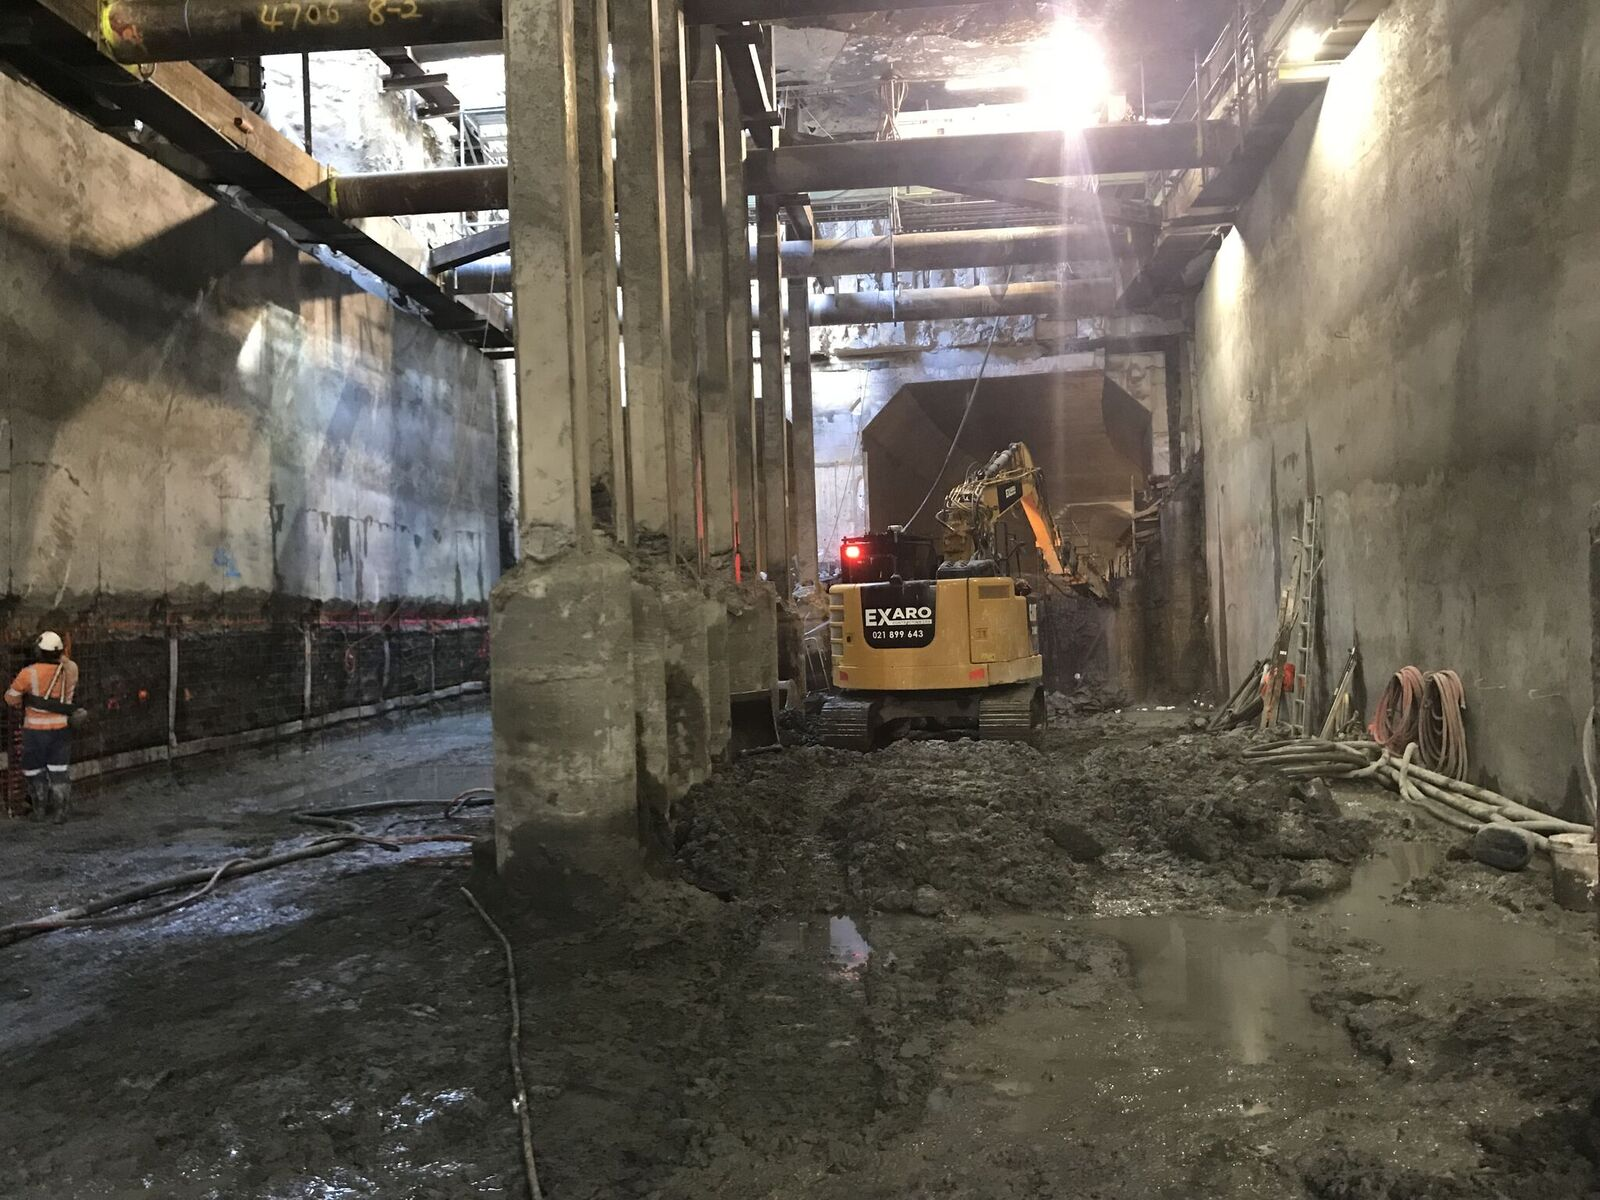 CRL construction in Albert Street near the intersection of Customs Street West 15 November 2018